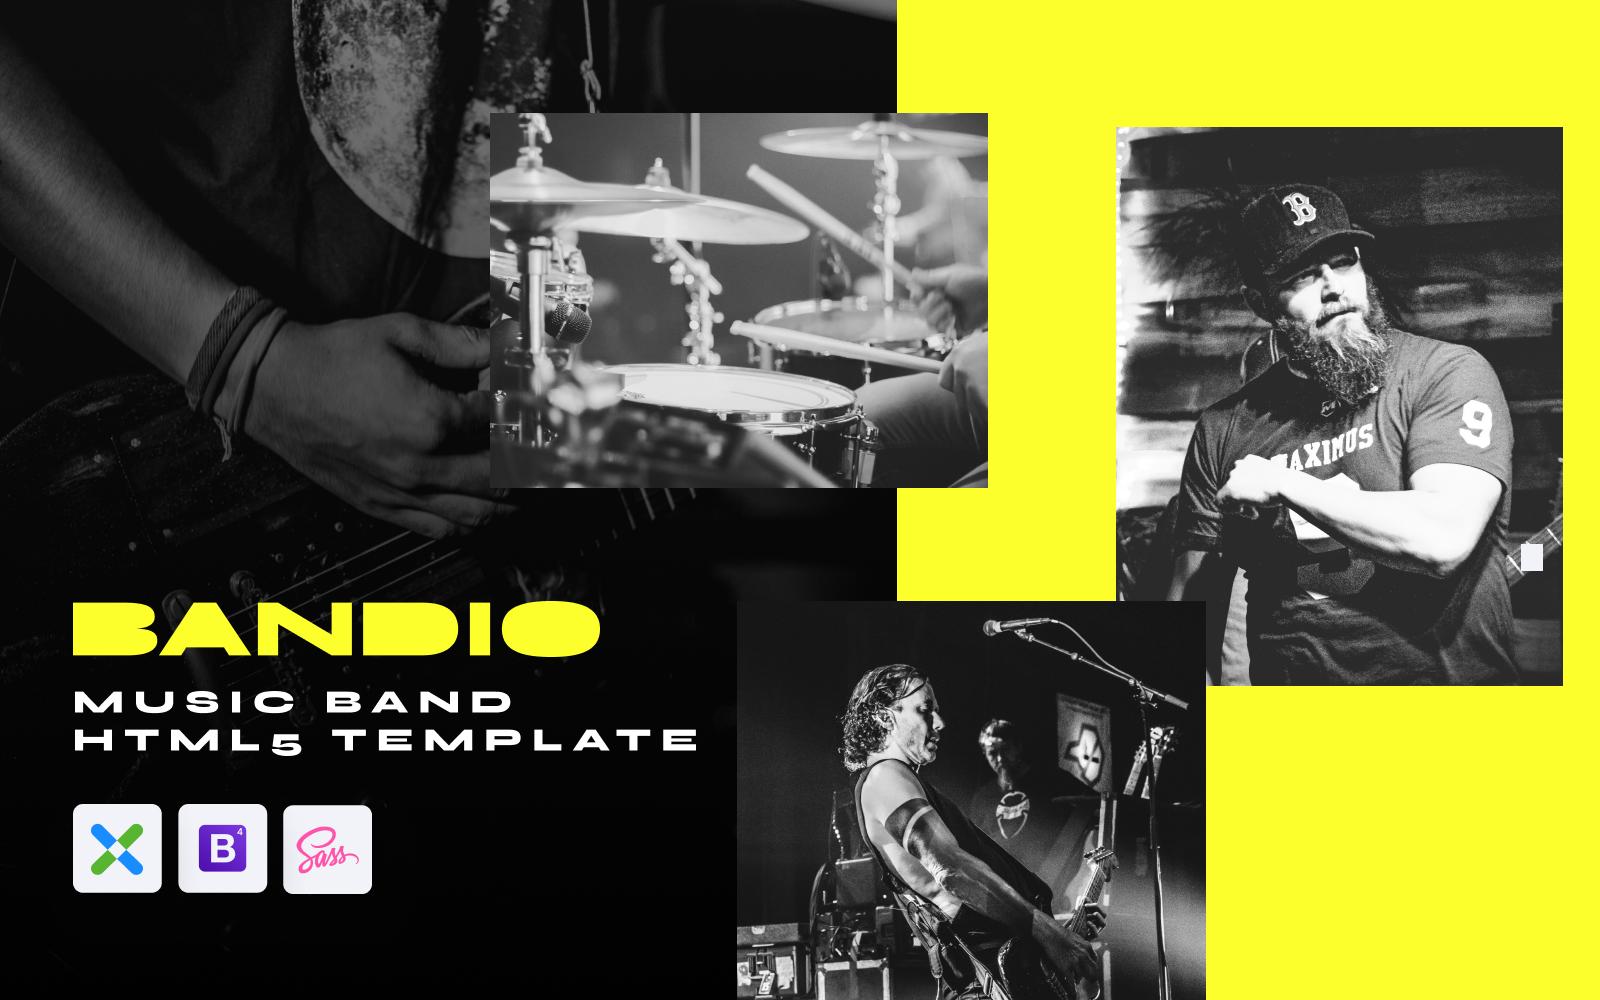 """Bandio - Modern HTML5 Music and Band"" 响应式网页模板 #148481"